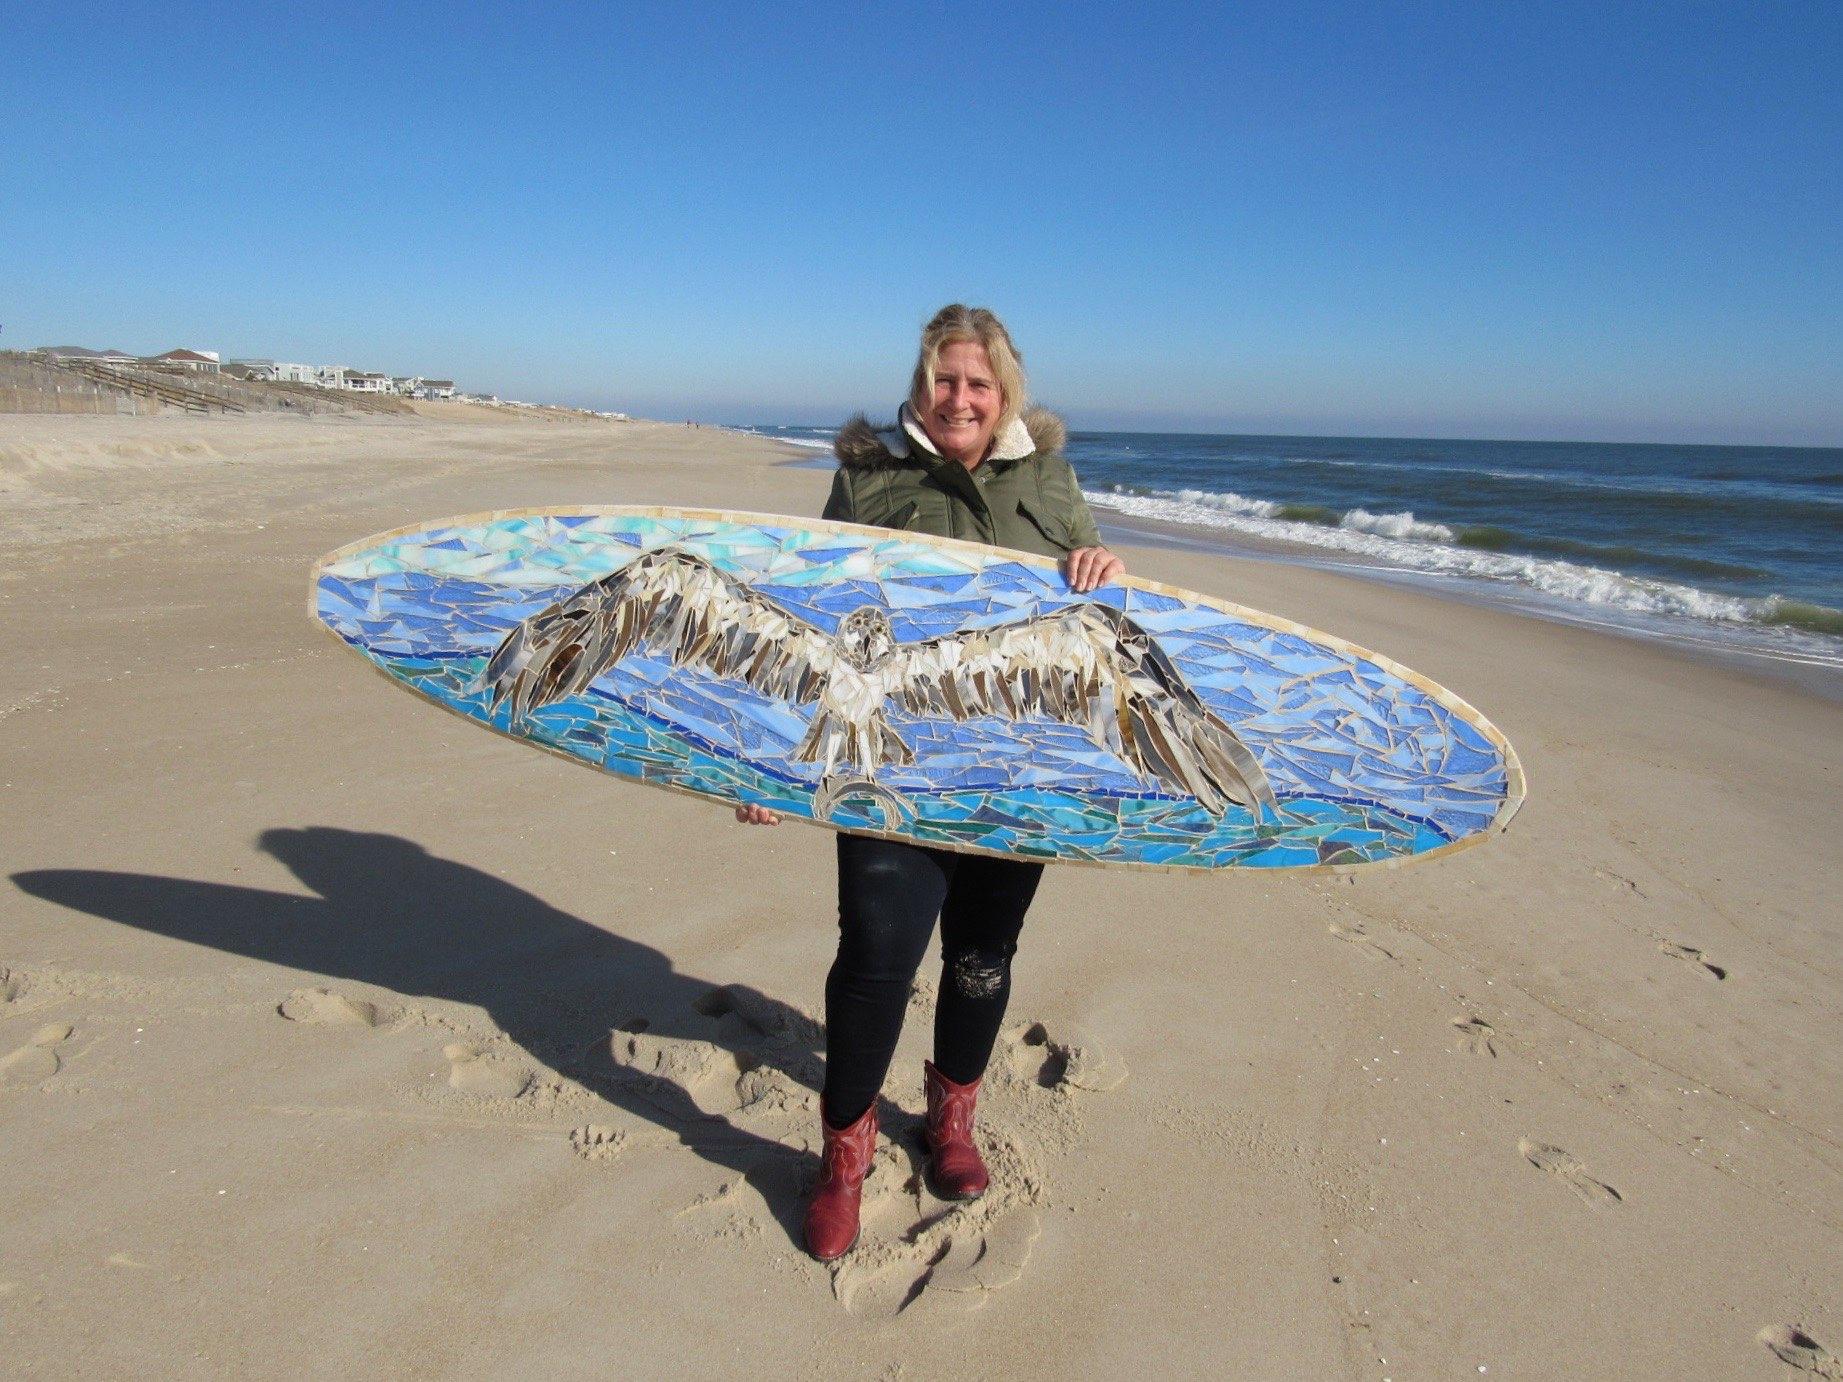 Ospreys Custom Glass Mosaic Surfboard  Custom made glass mosaic surfboard with majestic ospreys